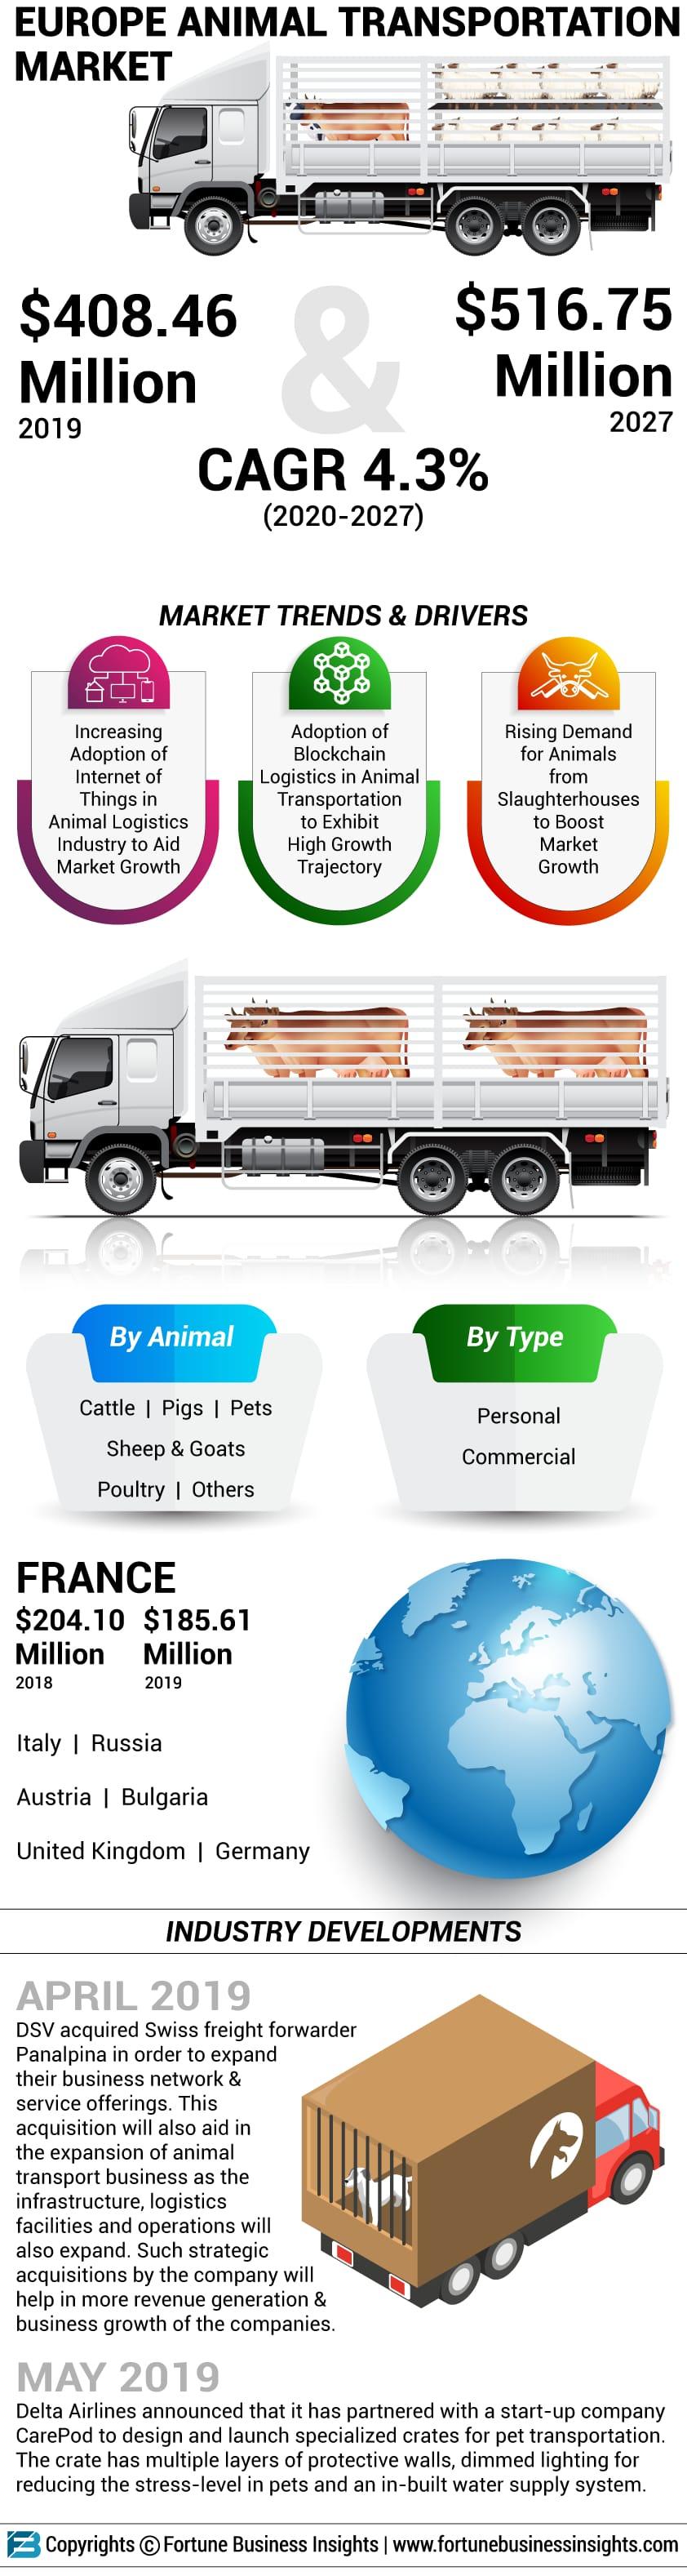 Europe Animal Transportation Market